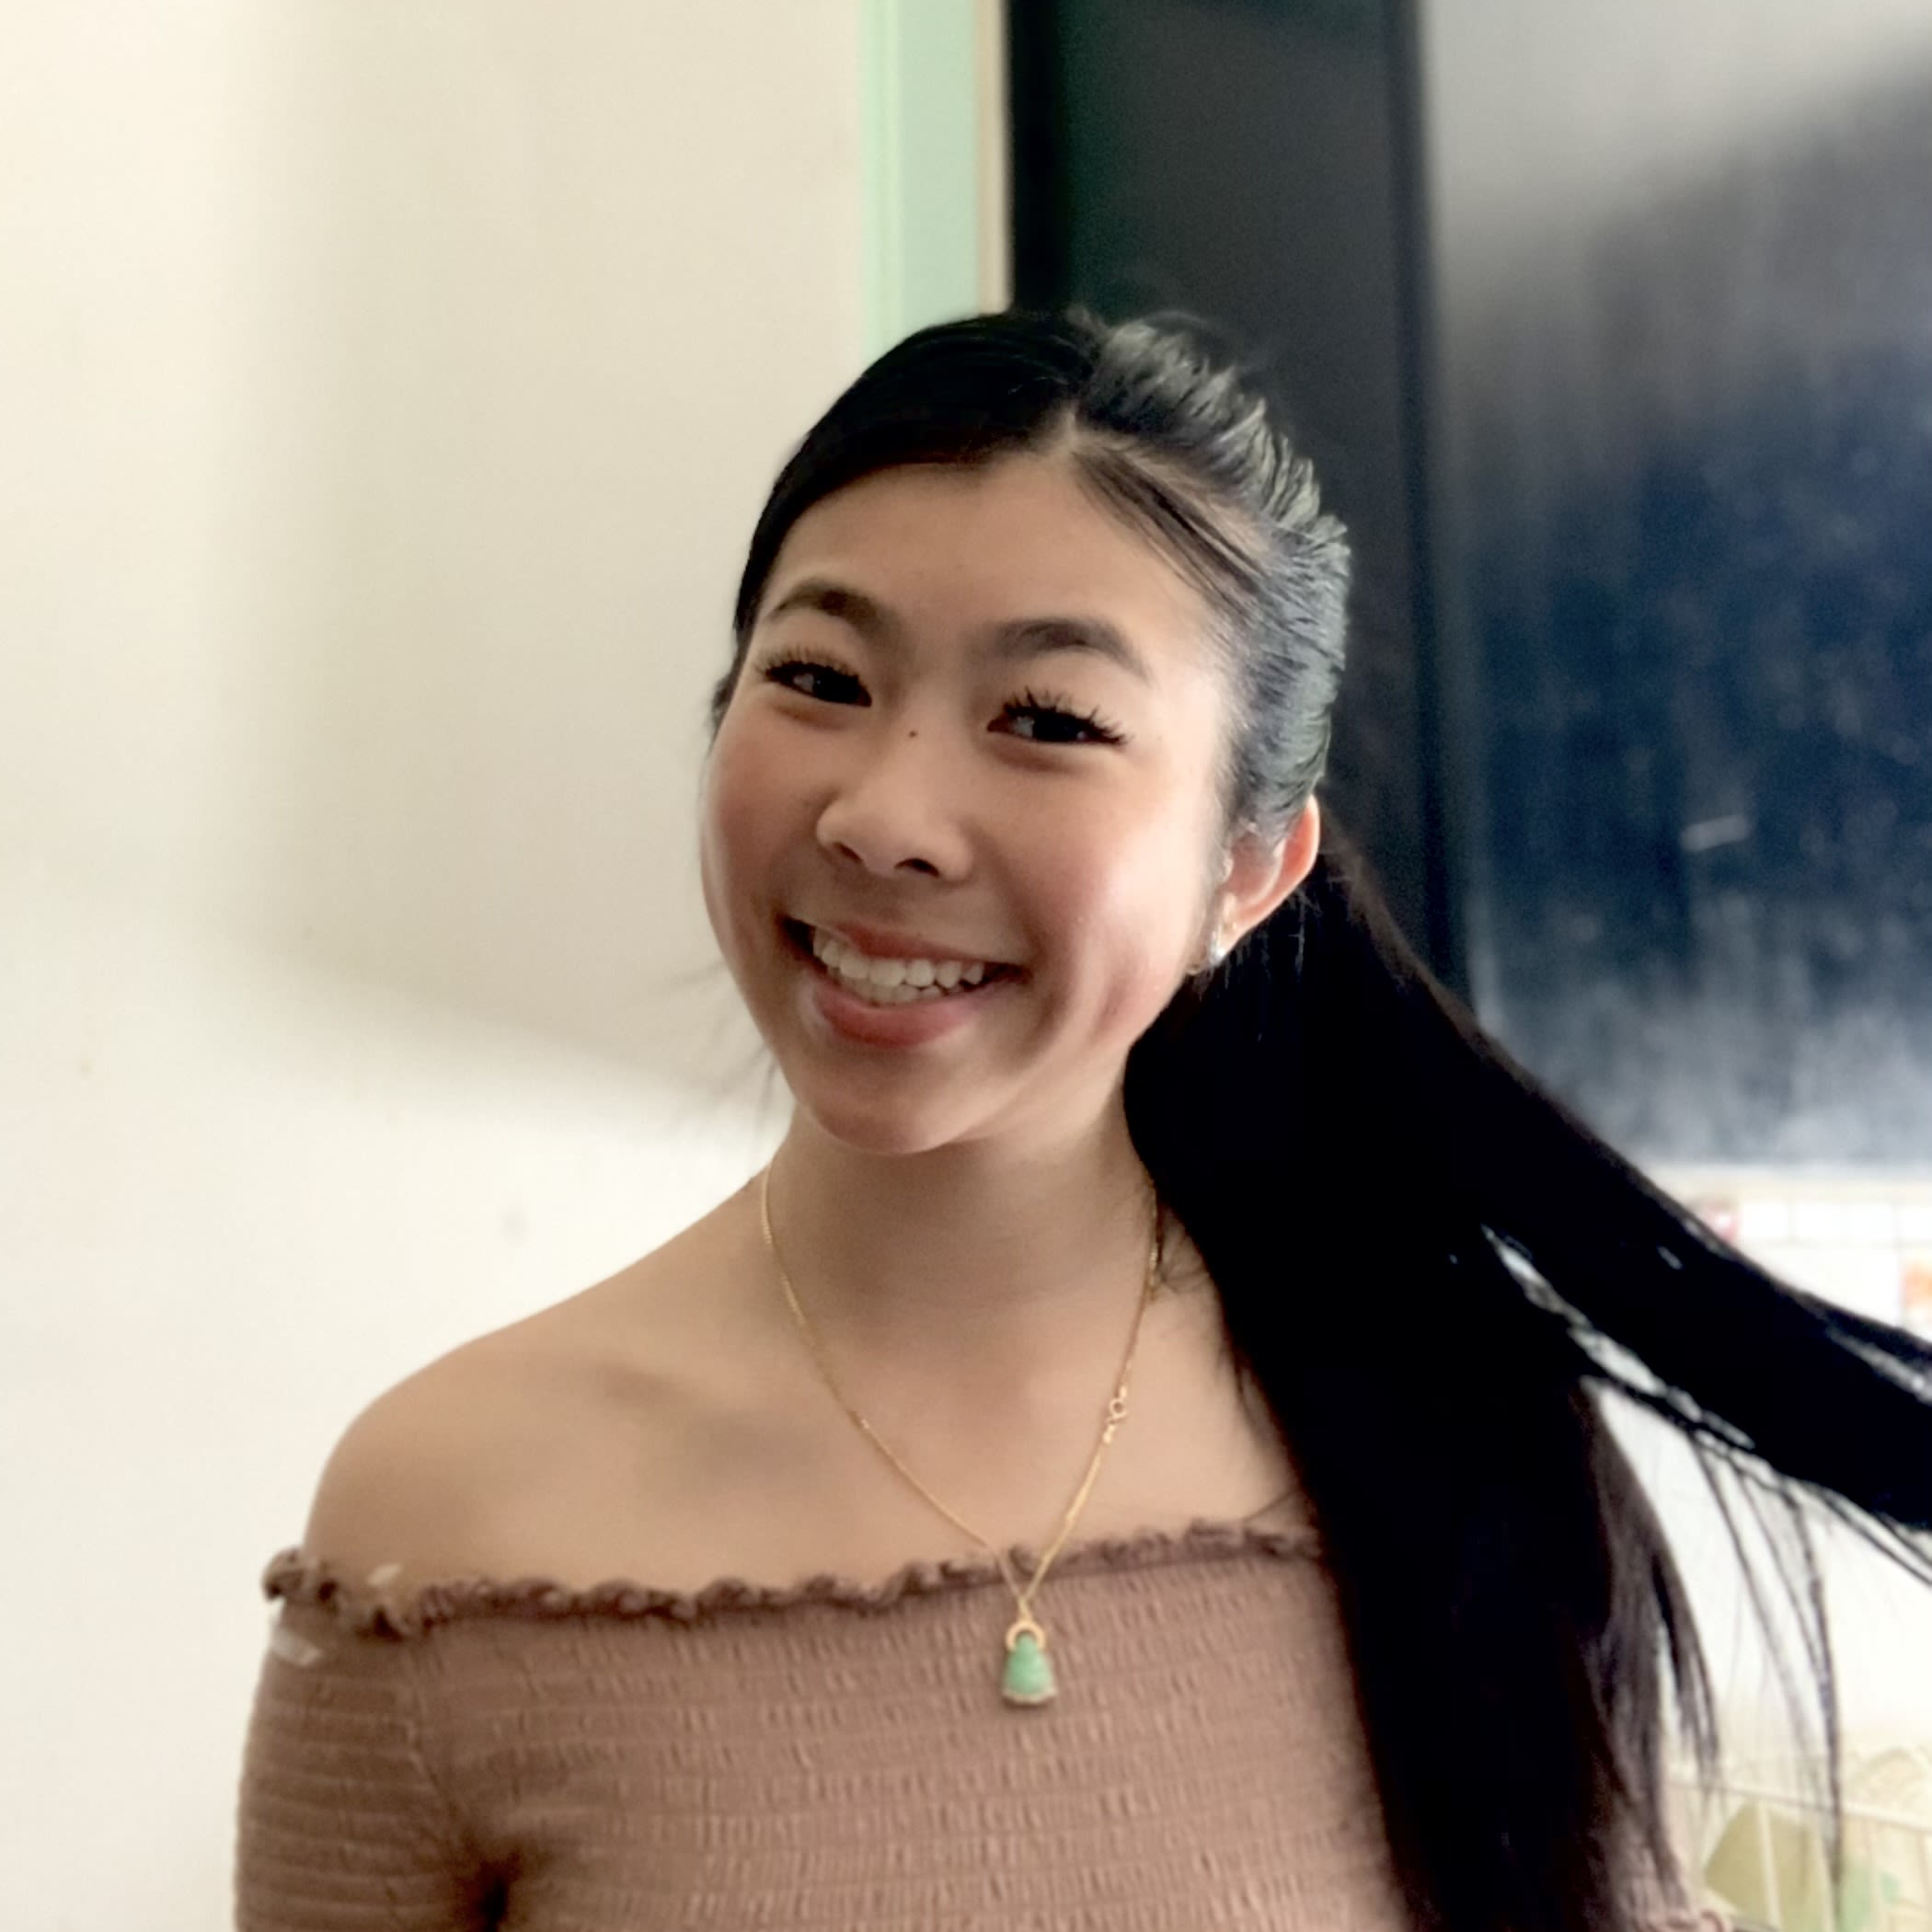 Cindy Luong